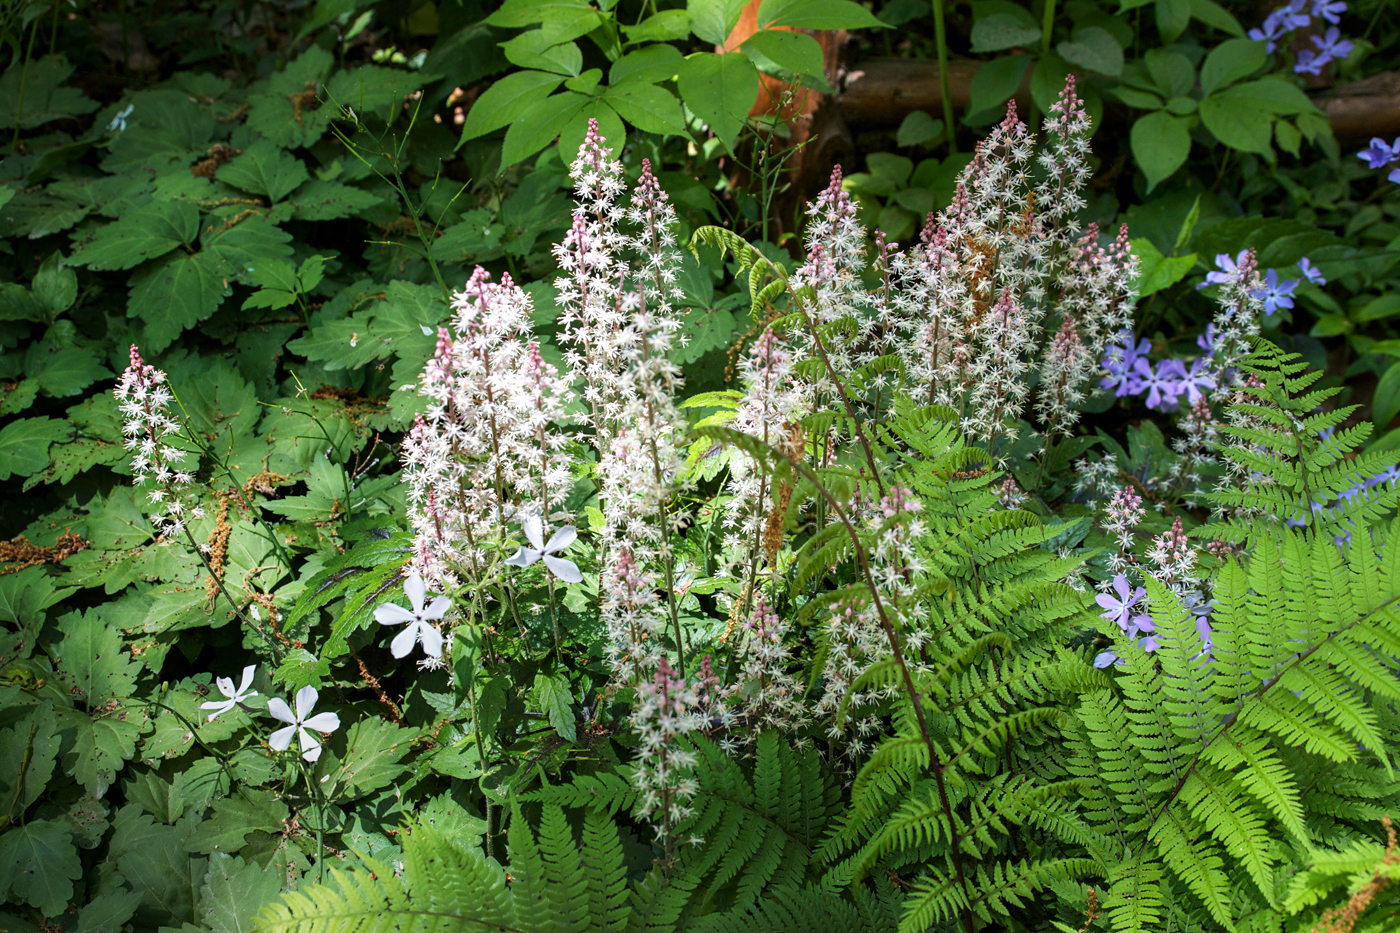 Garden in the Woods, foam flower, phlox and ferns, by Justine Hand for Gardenista